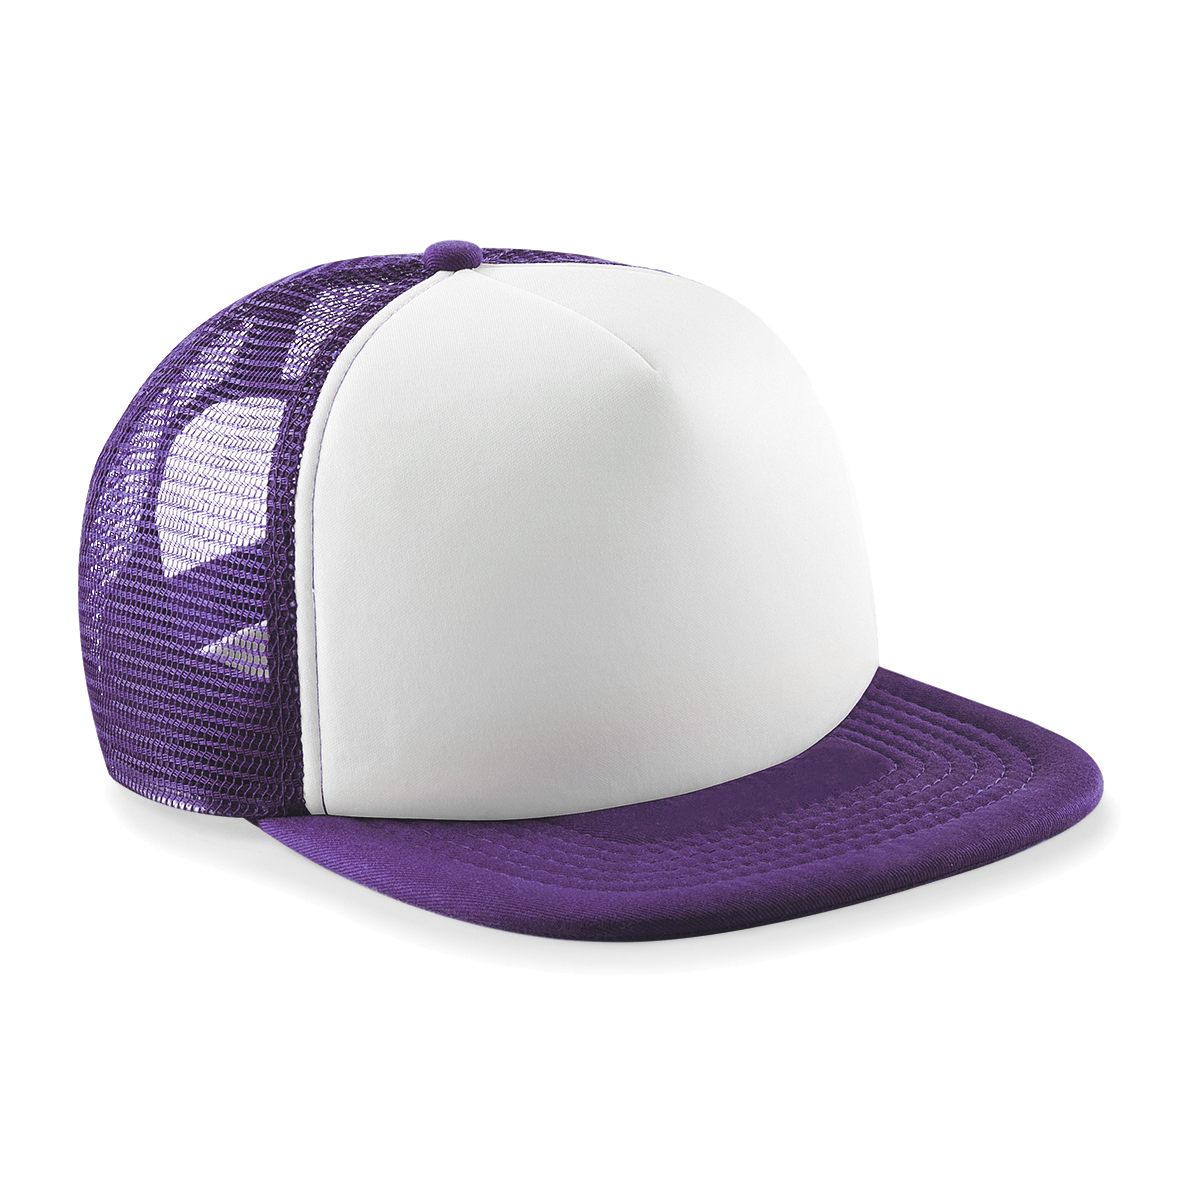 0c2c6eea96d Creative Snapbacks Custom Embroidered Hats. B645B Vintage Youth Trucker